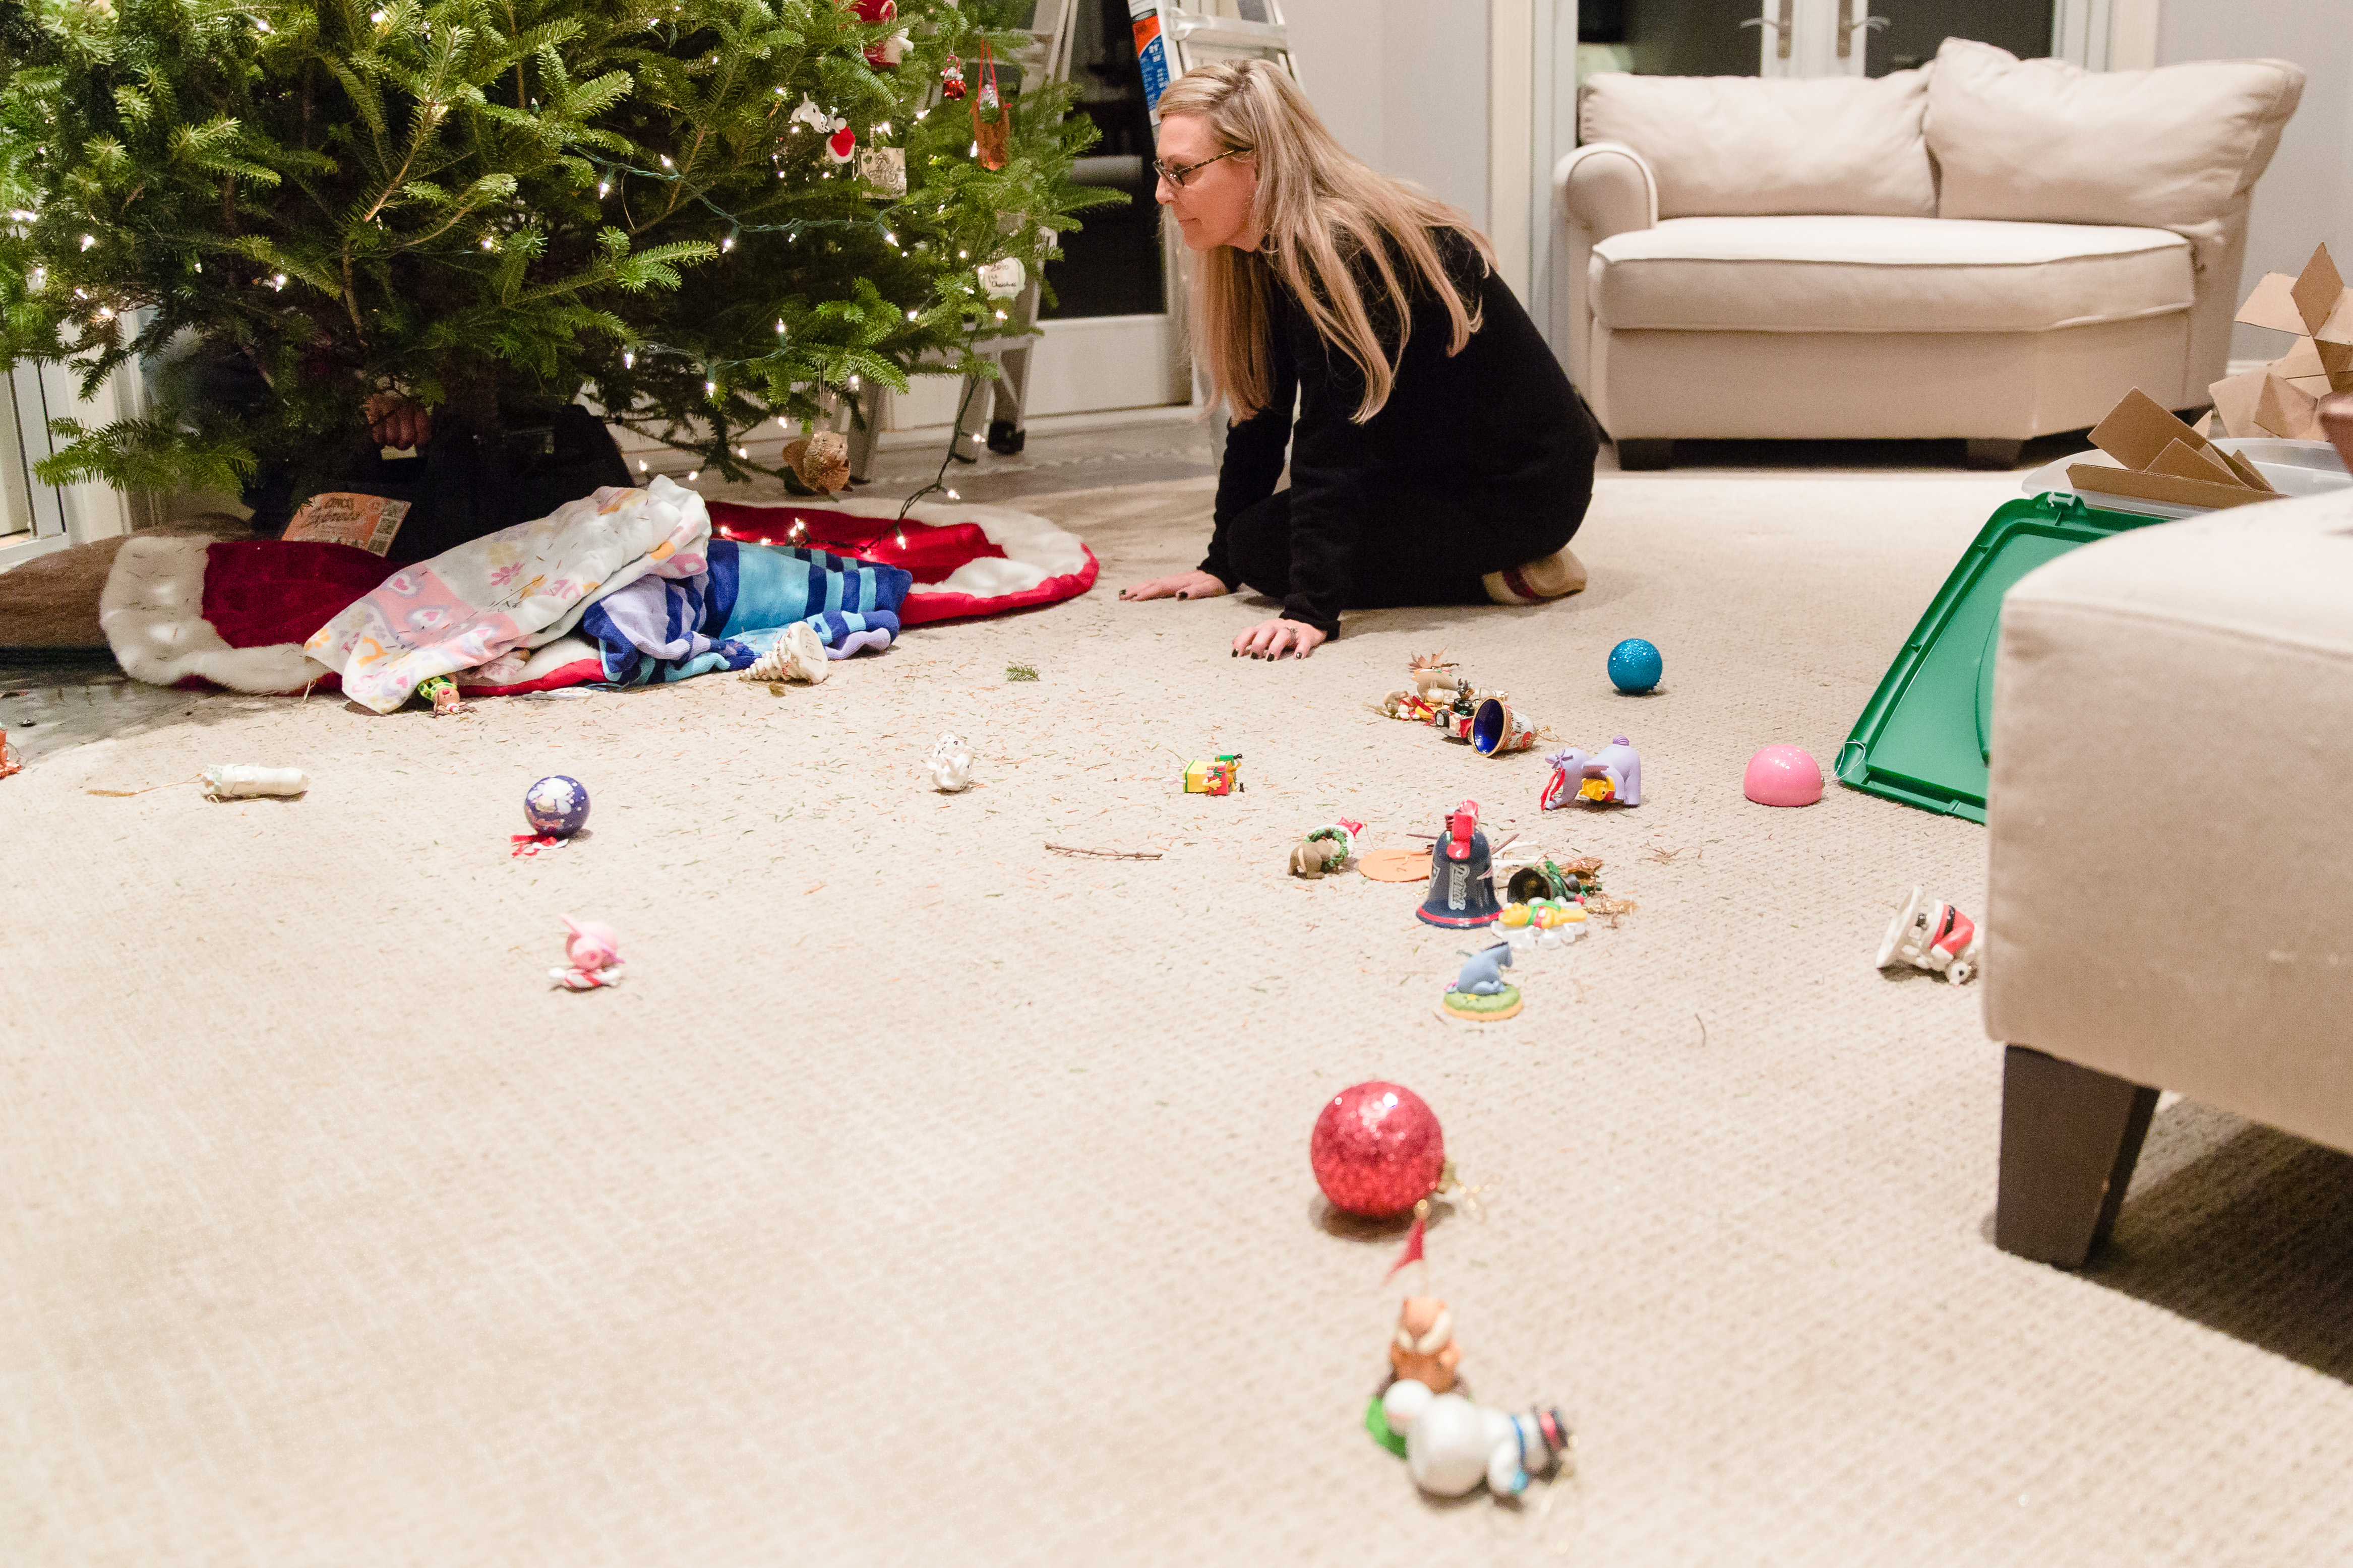 mom on floor cleaning up broken ornaments